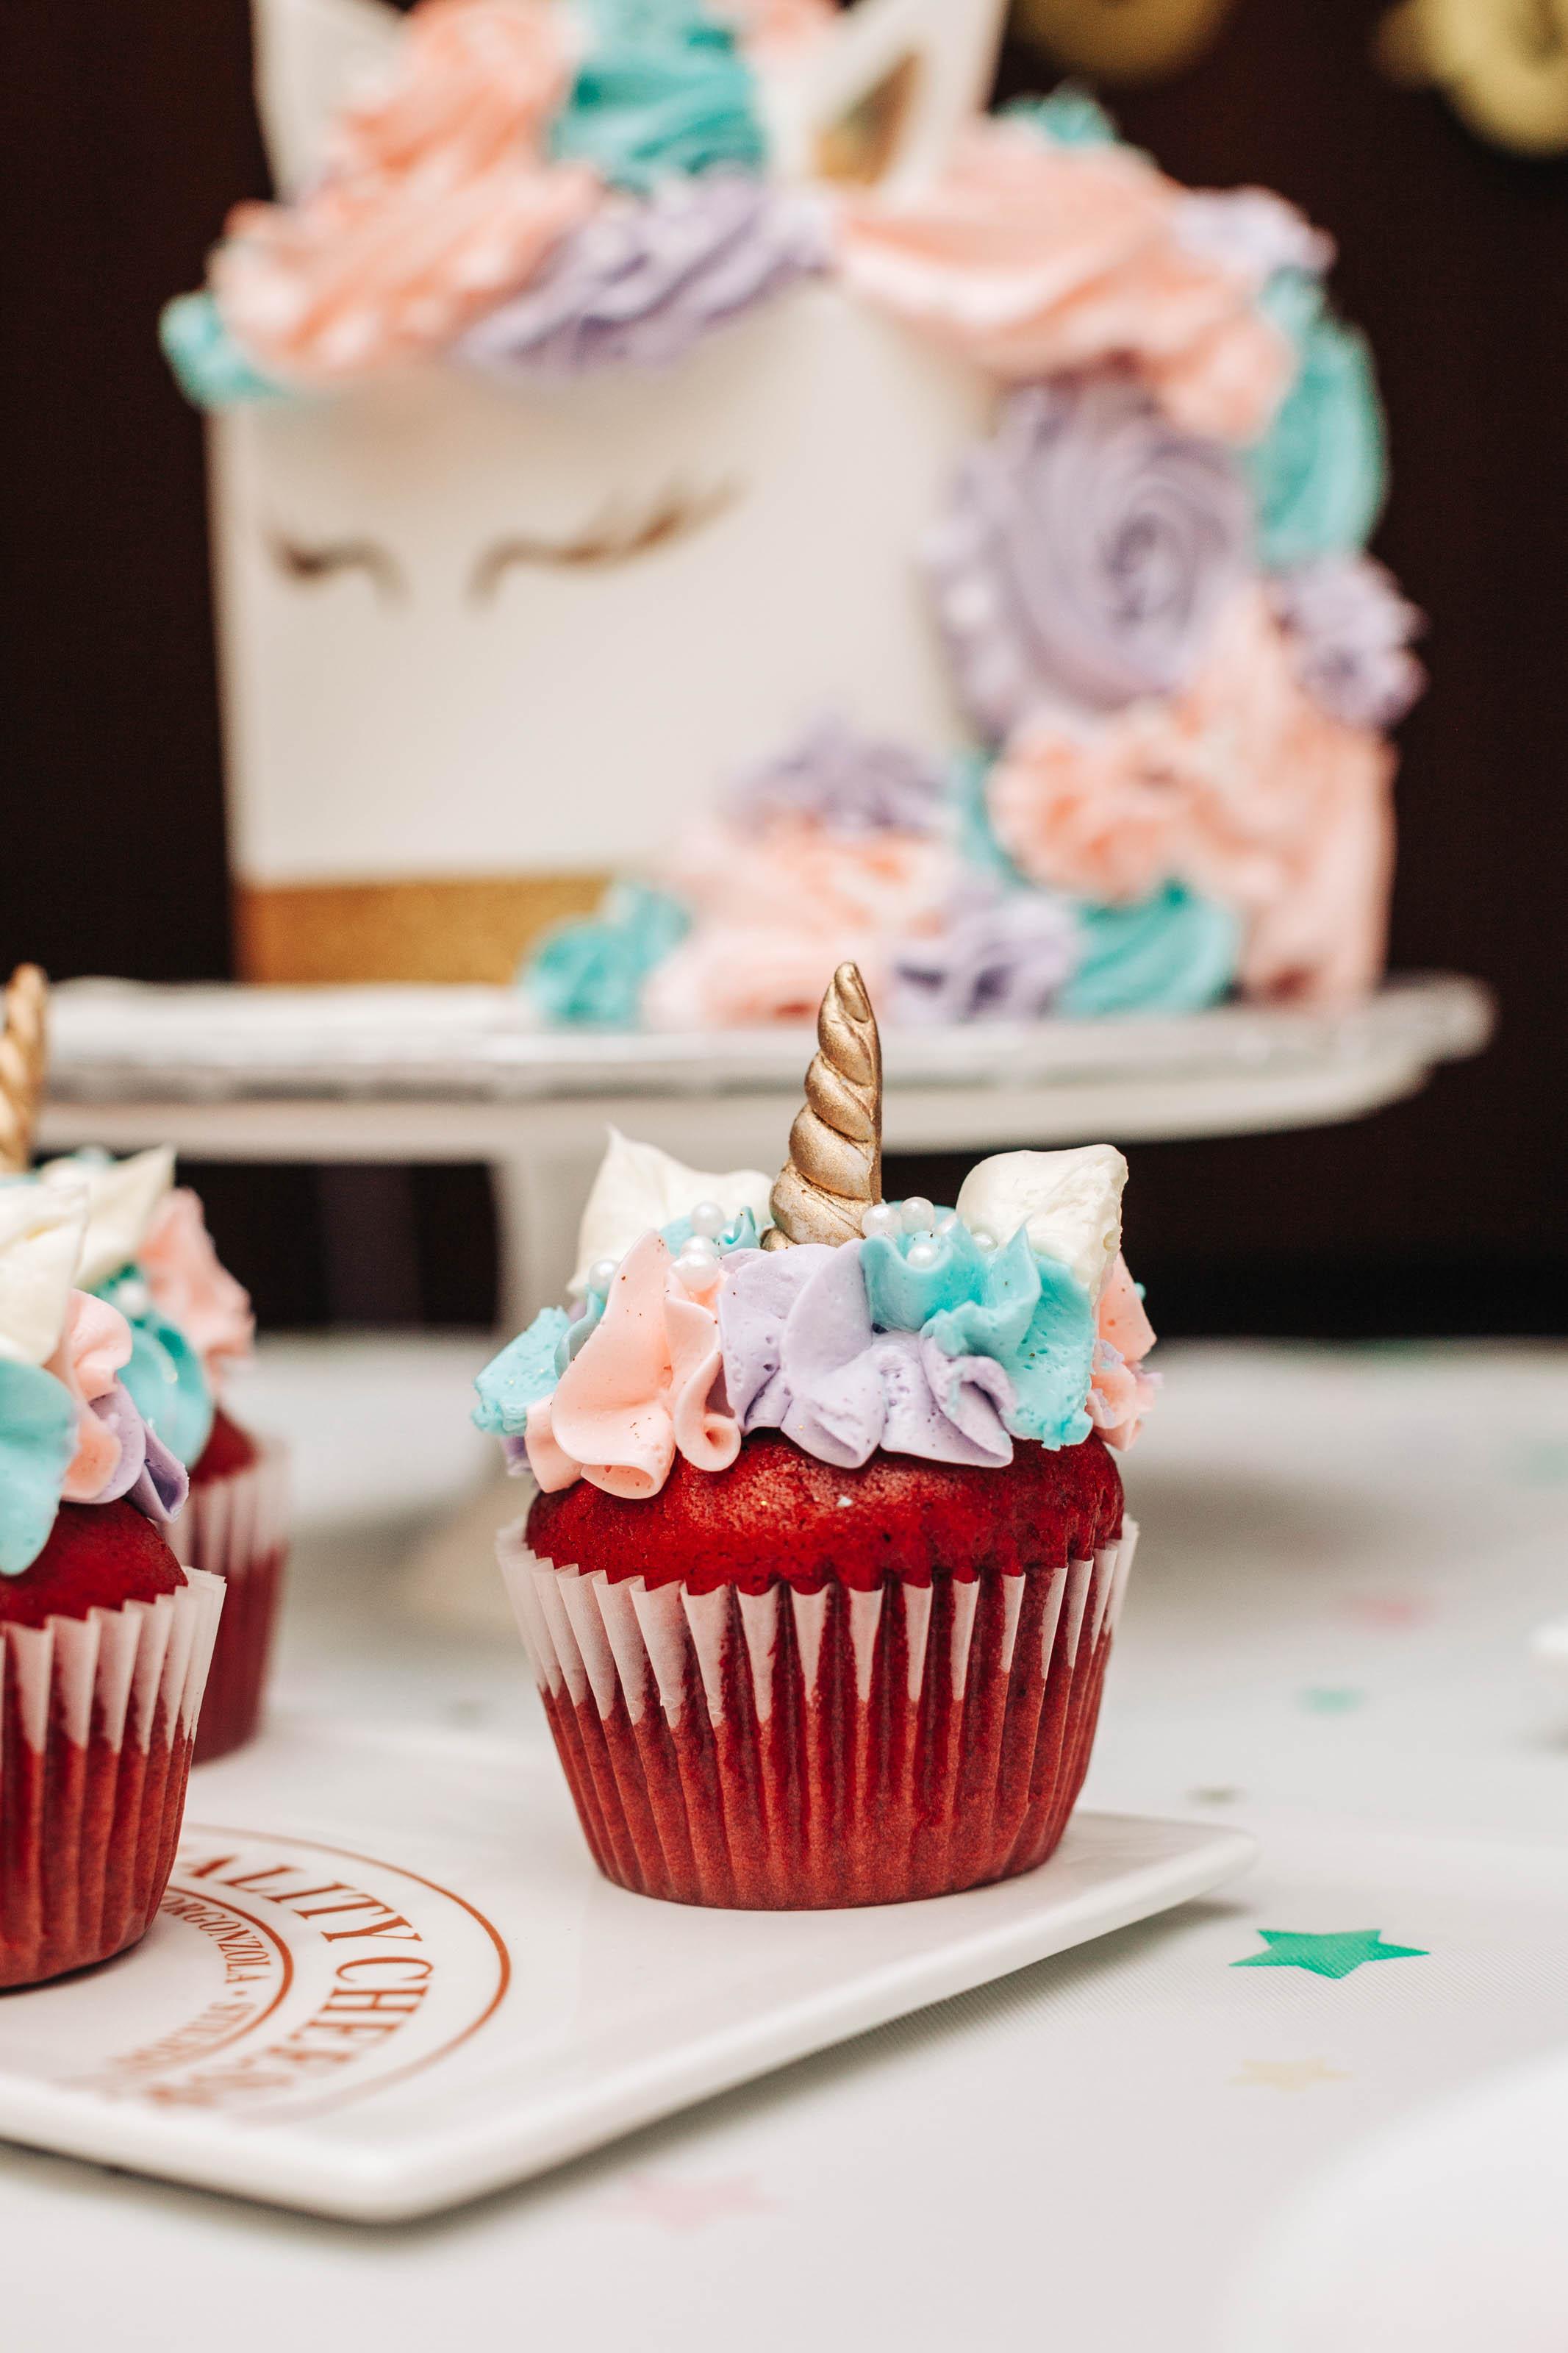 unicorn-bday-cake-edmonton